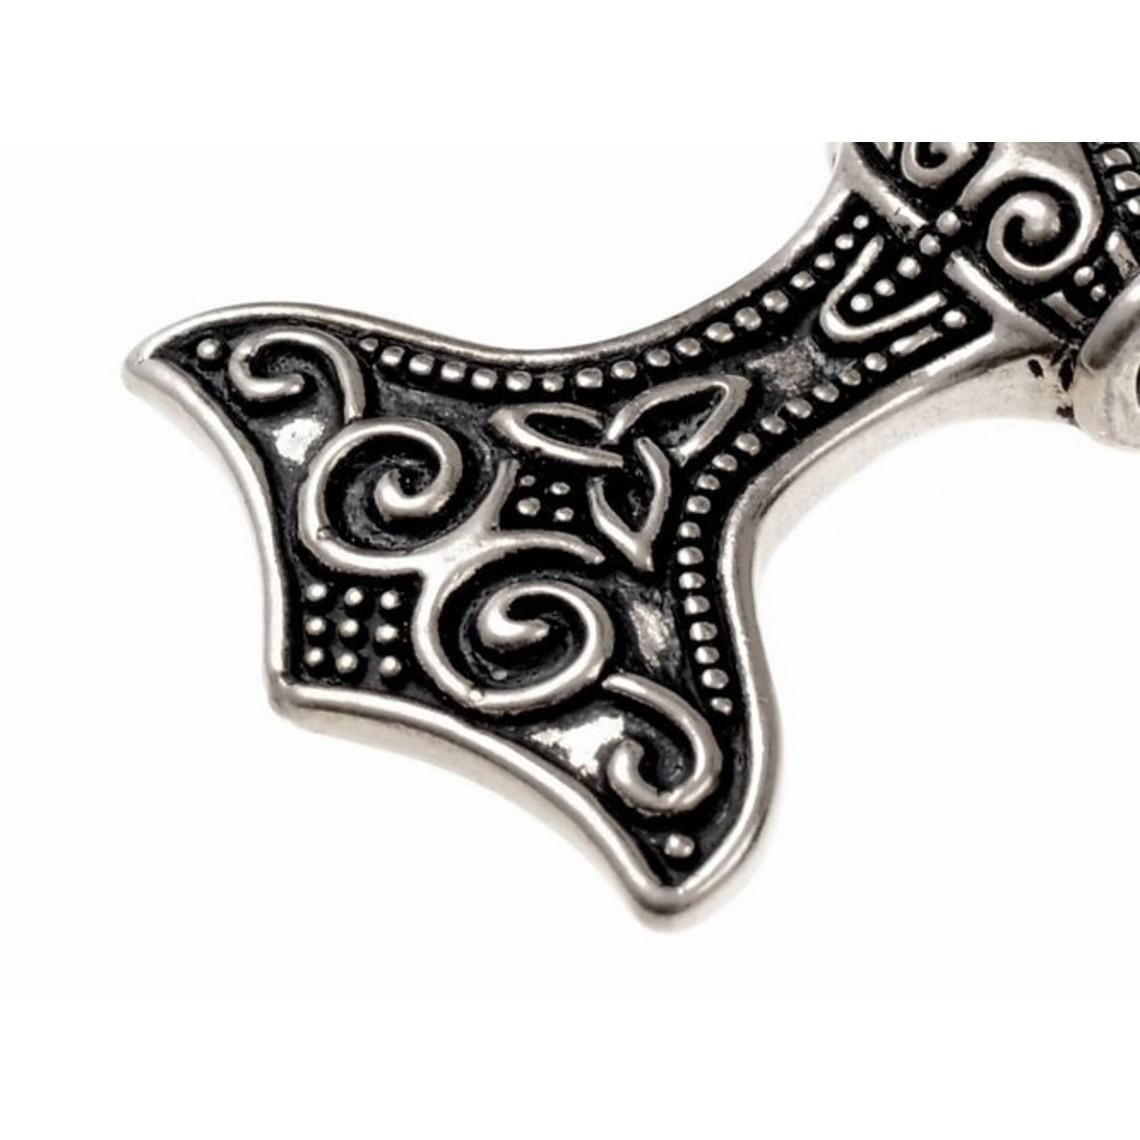 Rusvik Thor's hammer, silvered